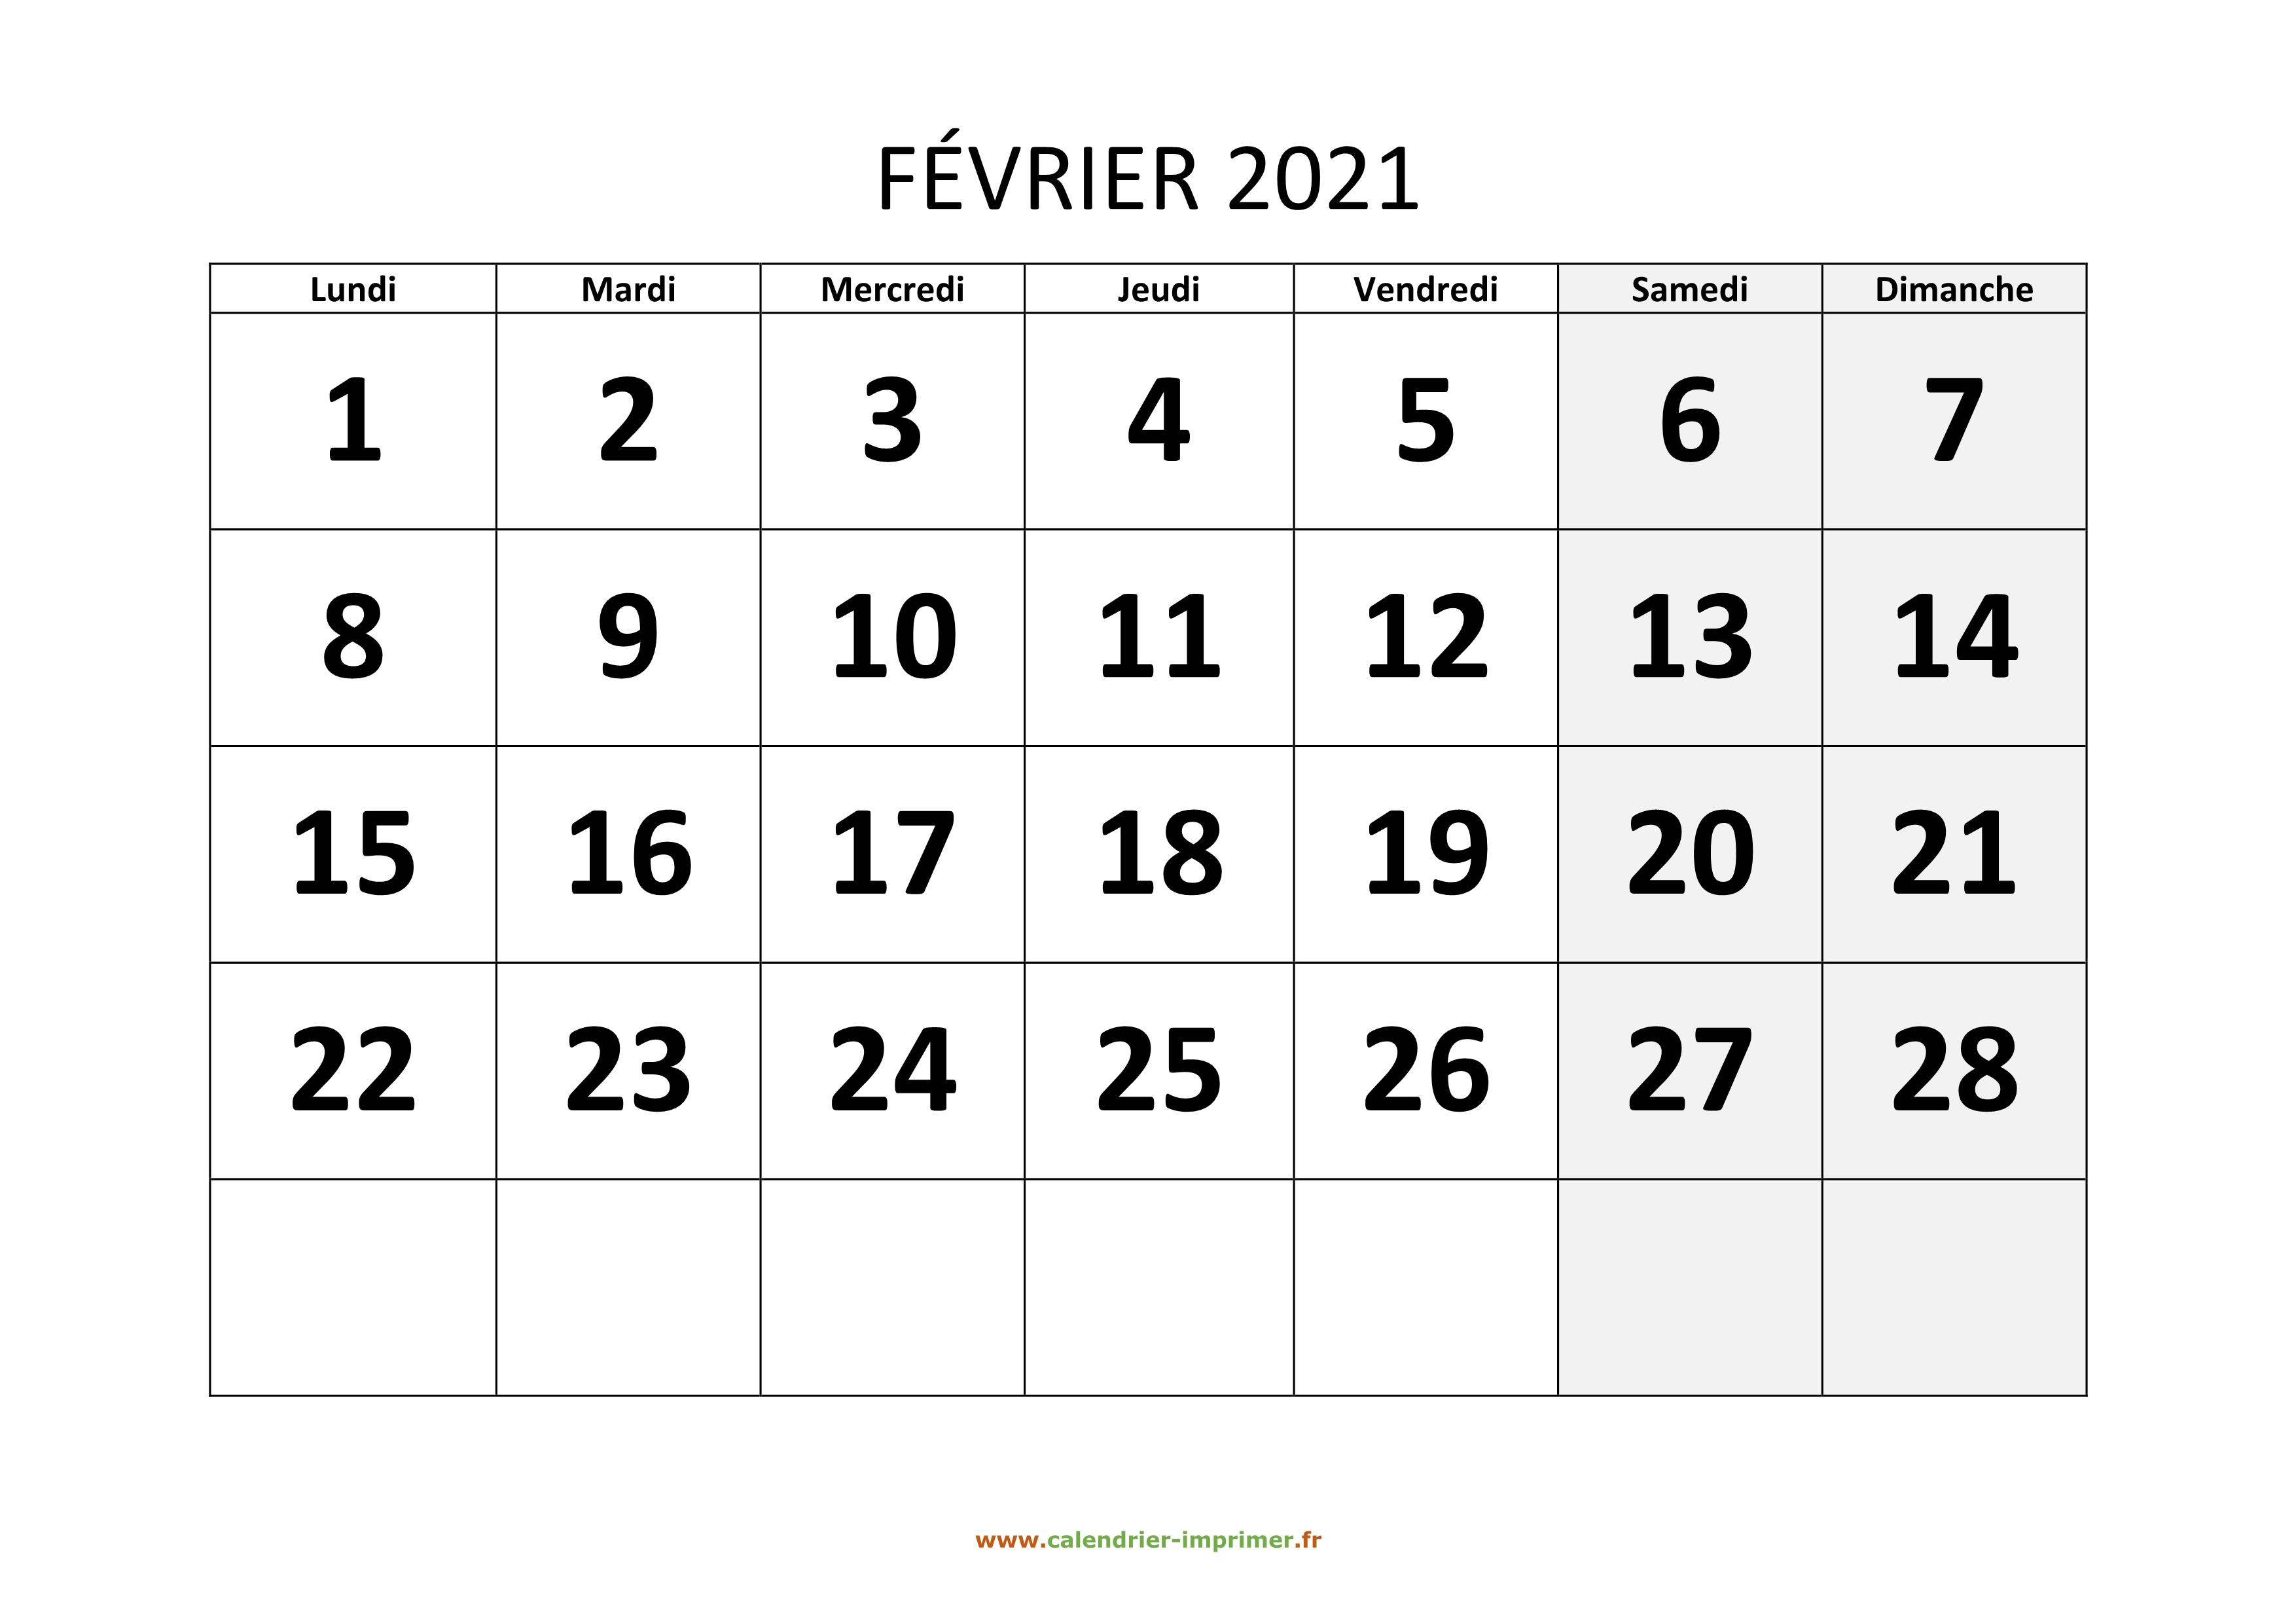 Calendrier Fevrier Mars 2021 Calendrier Février 2021 à imprimer